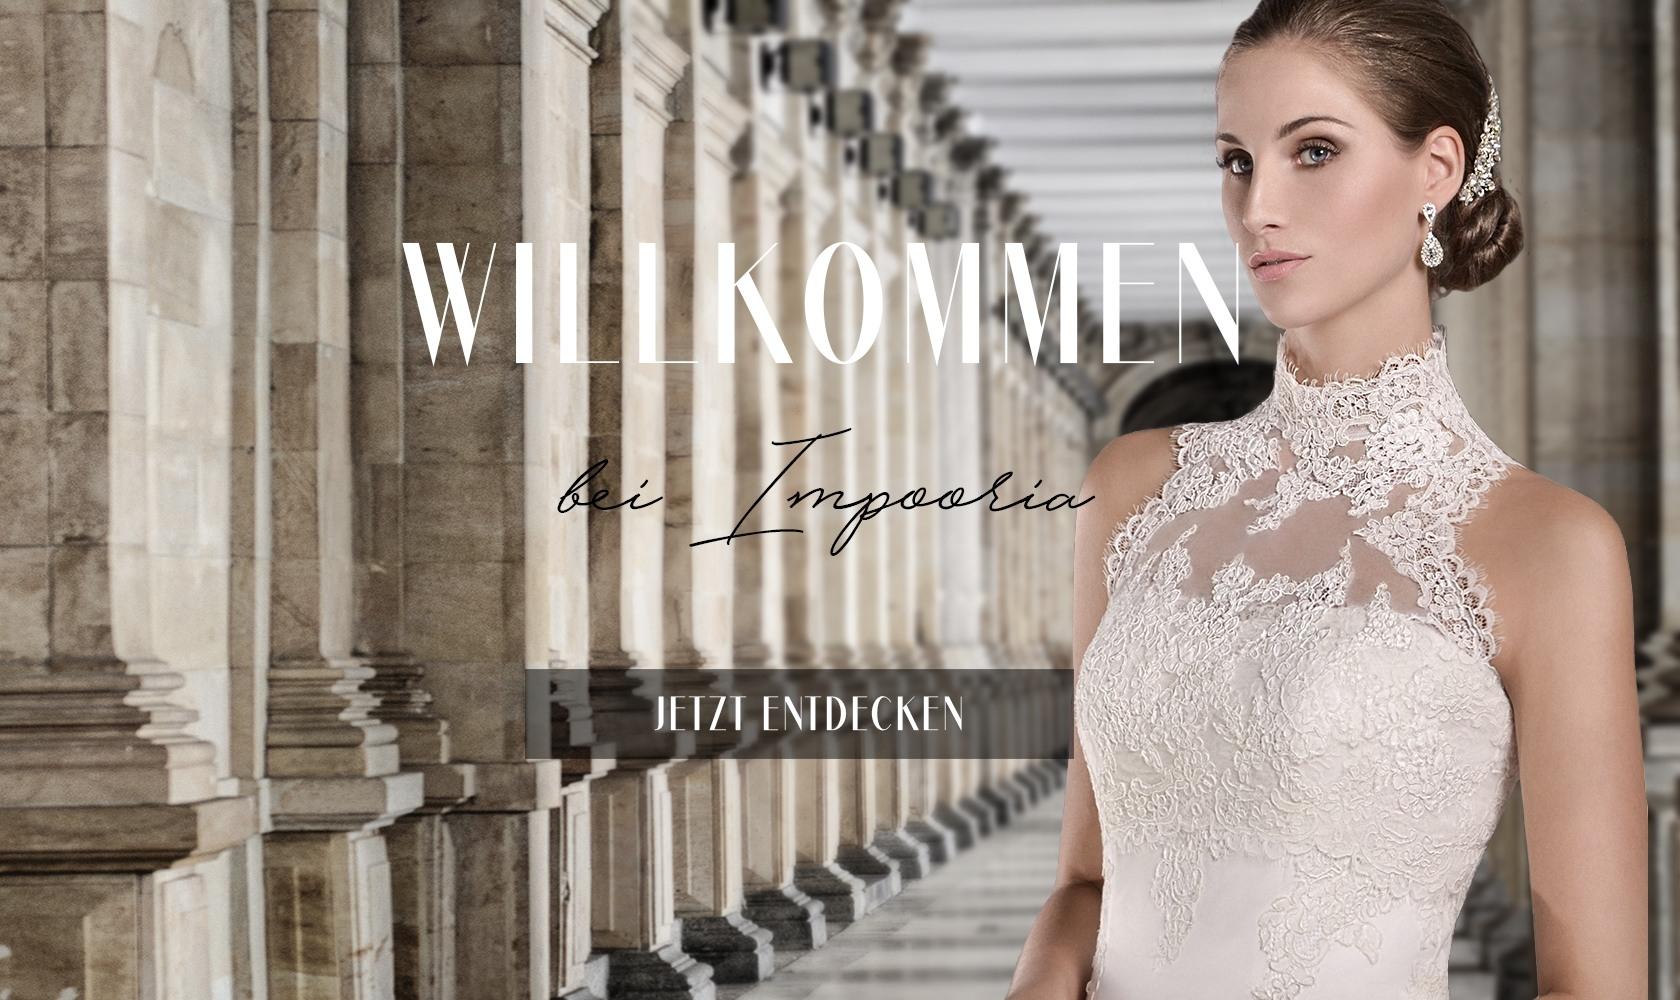 10 Großartig Brautkleider Online Shop Ärmel17 Fantastisch Brautkleider Online Shop Vertrieb